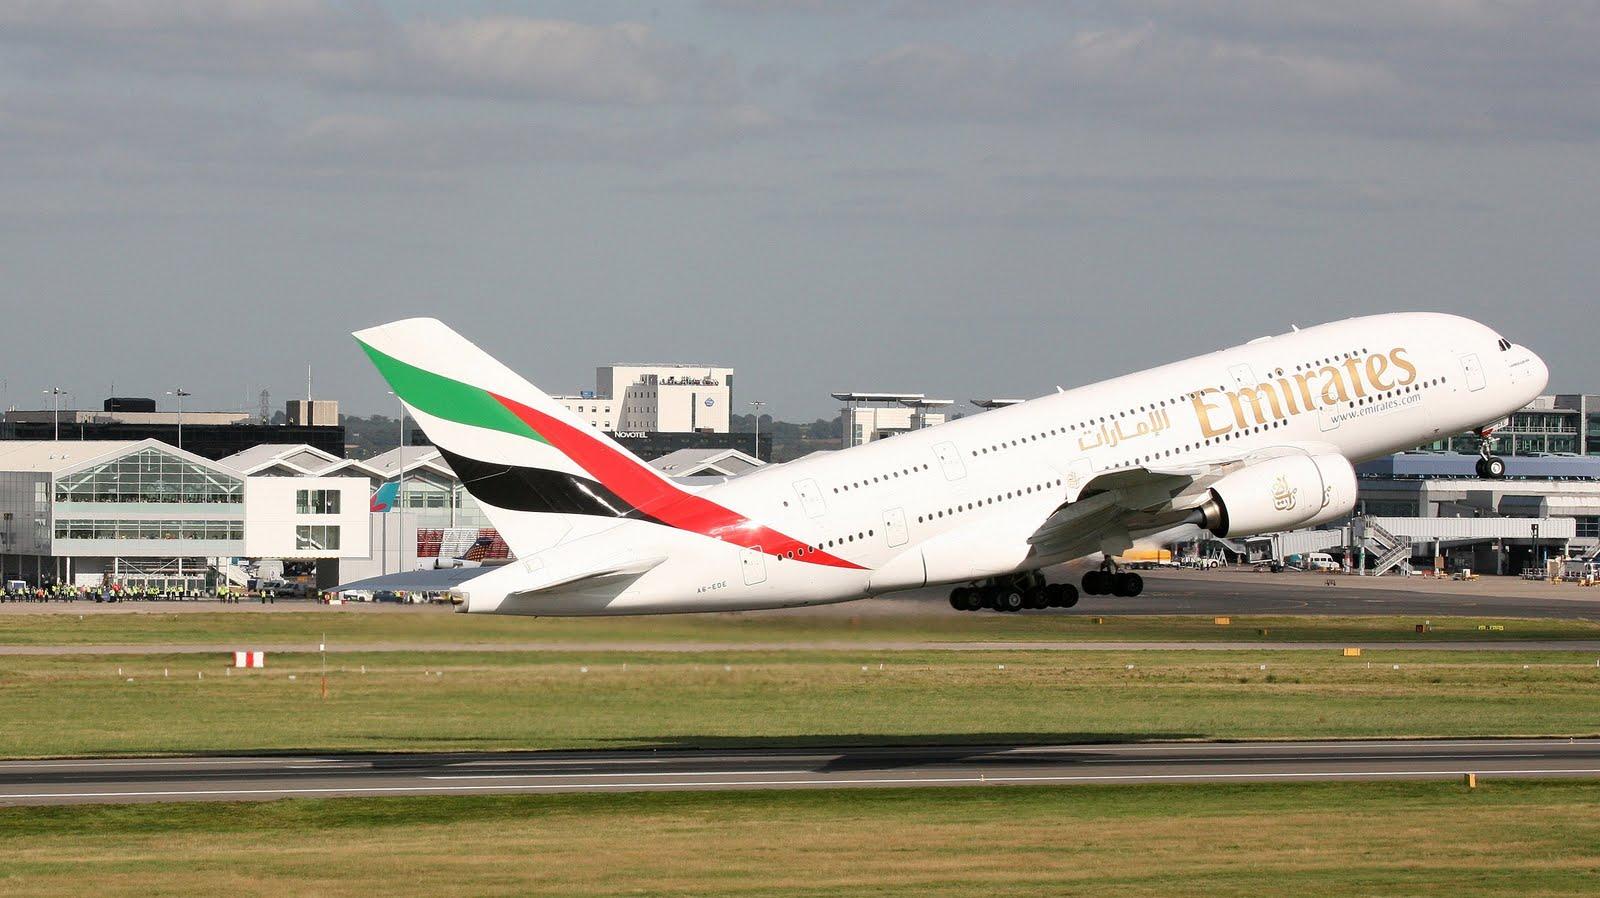 44+] A380 Take Off Wallpaper on WallpaperSafari